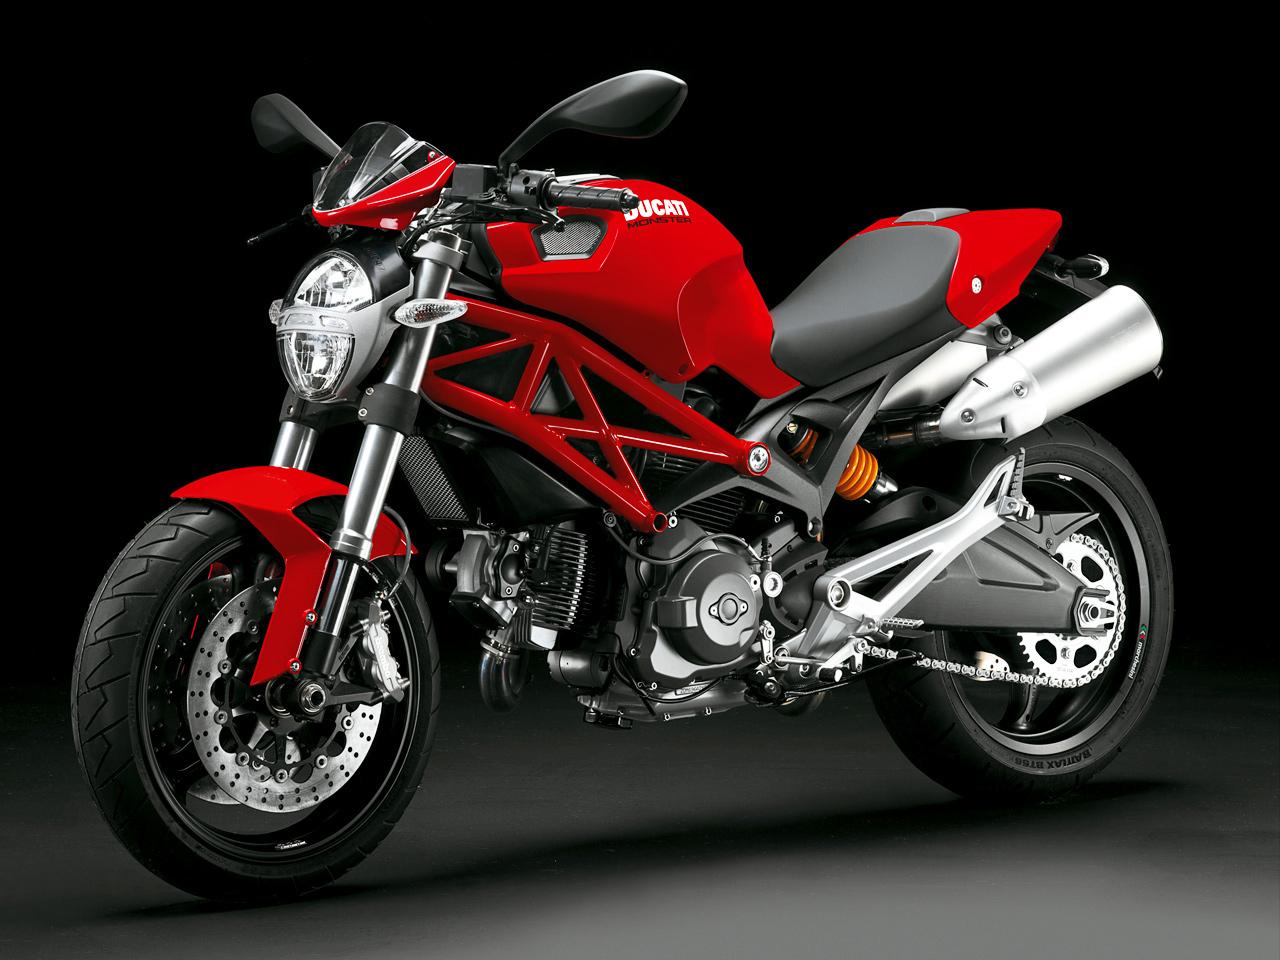 Ducati Monster 696 Bike Special